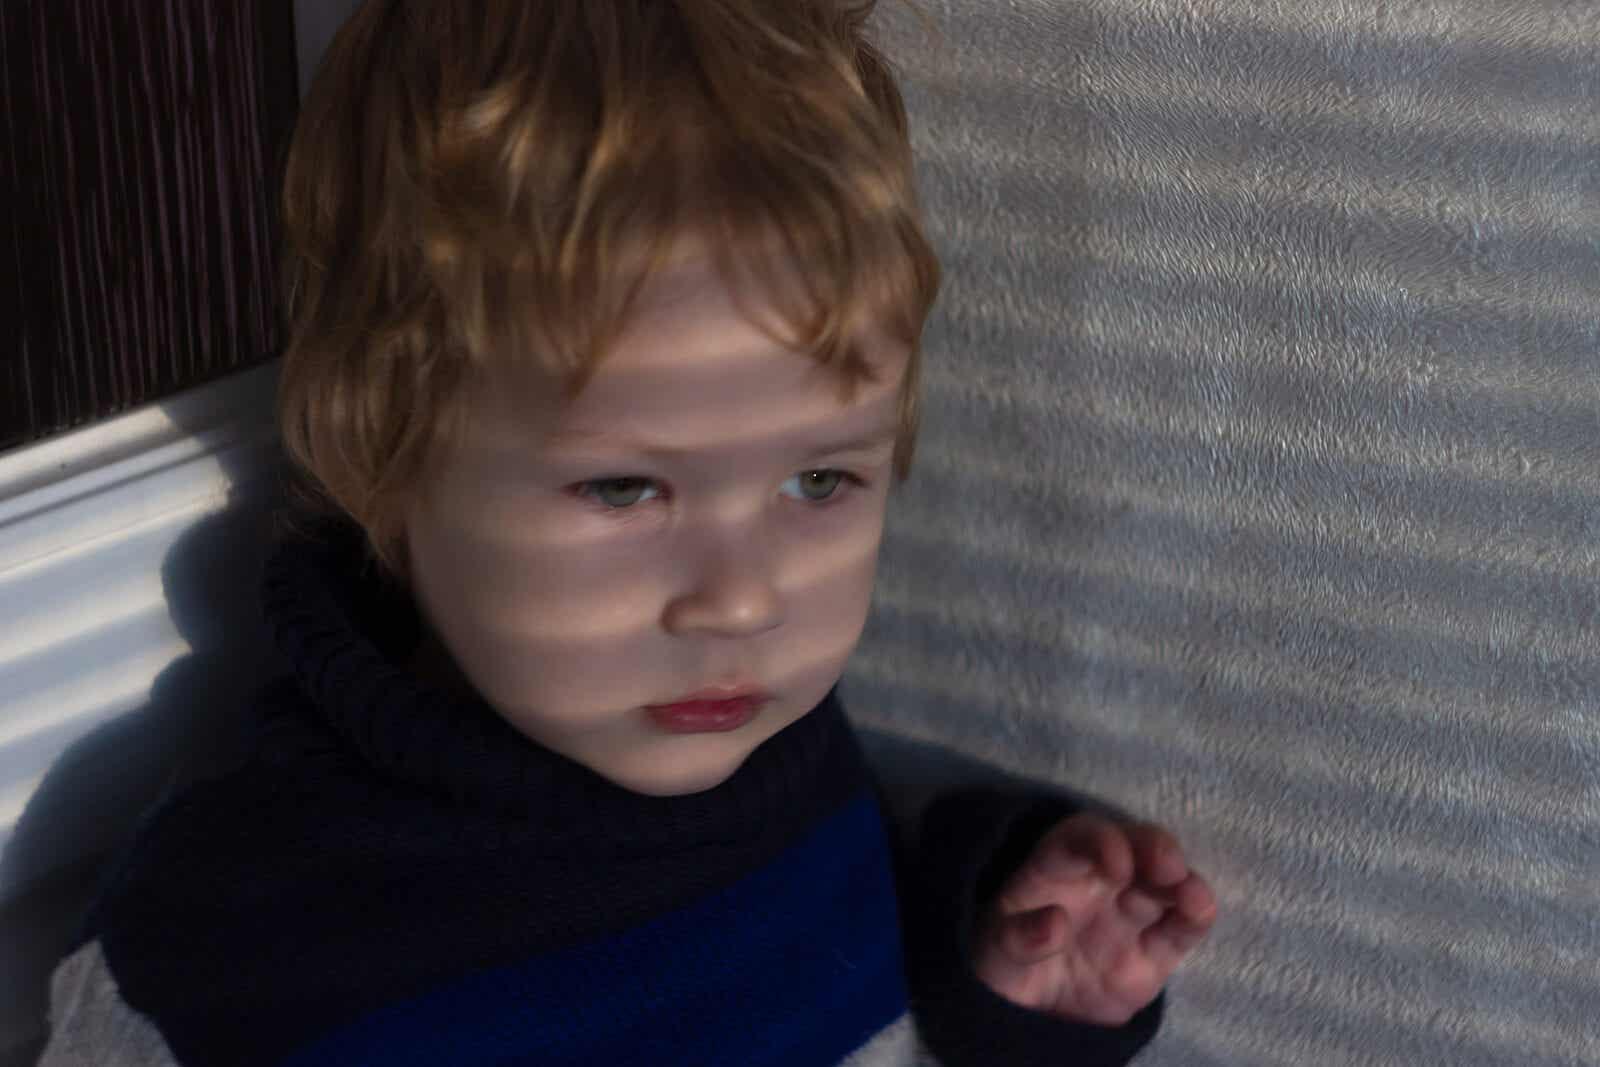 A sensitive toddler boy sitting in a corner.